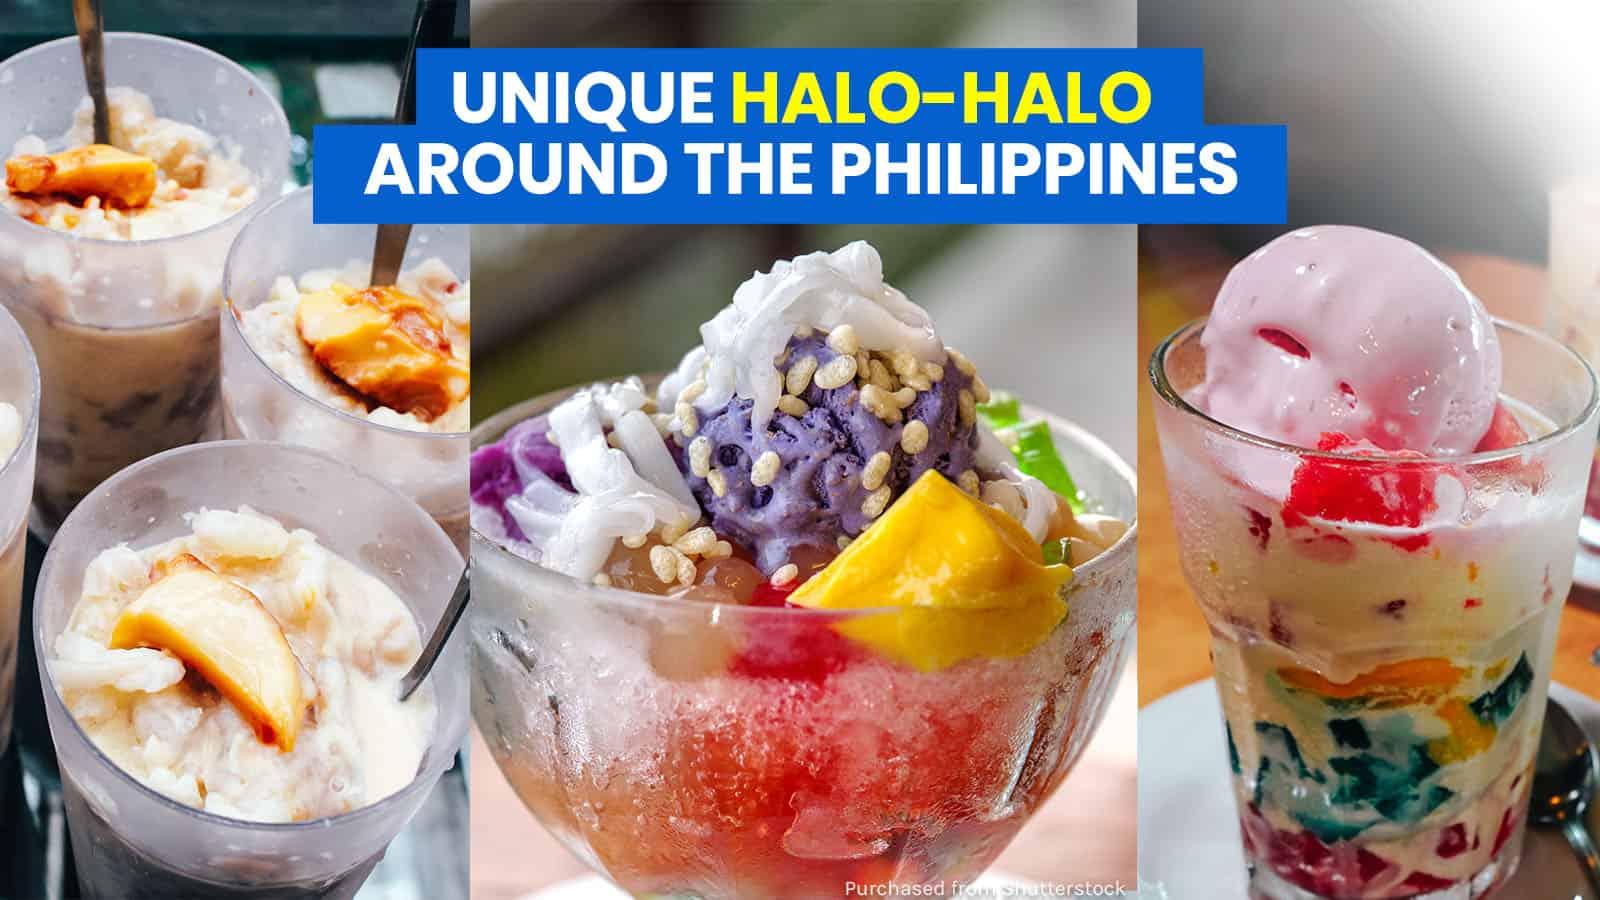 7 Unique HALO-HALO Versions around the Philippines